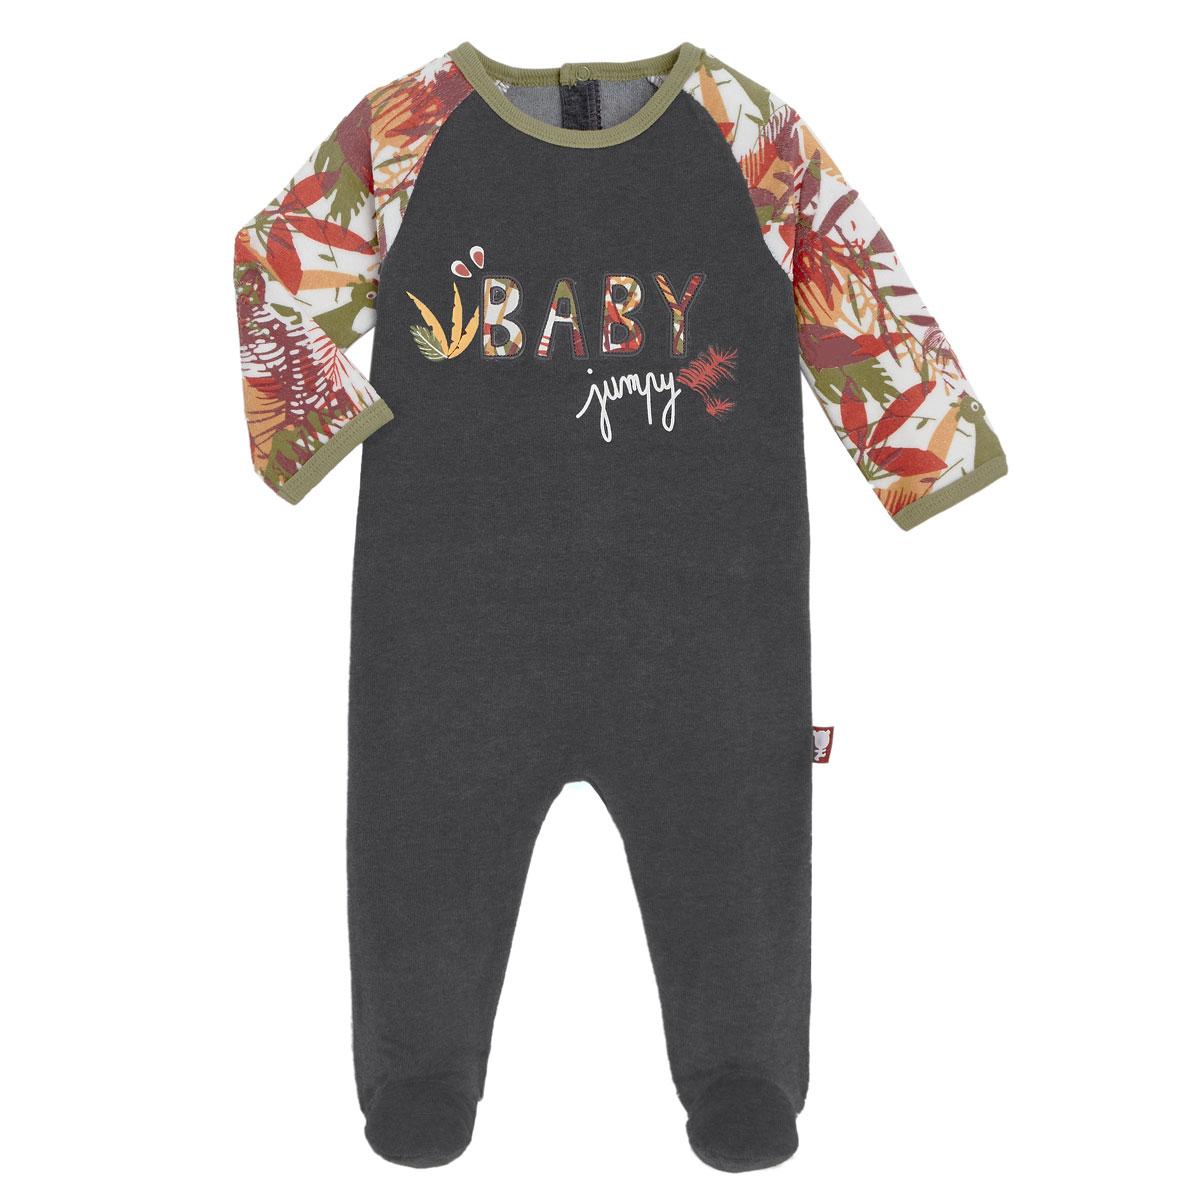 Pyjama bébé en velours contenant du coton bio Baby Jumpy